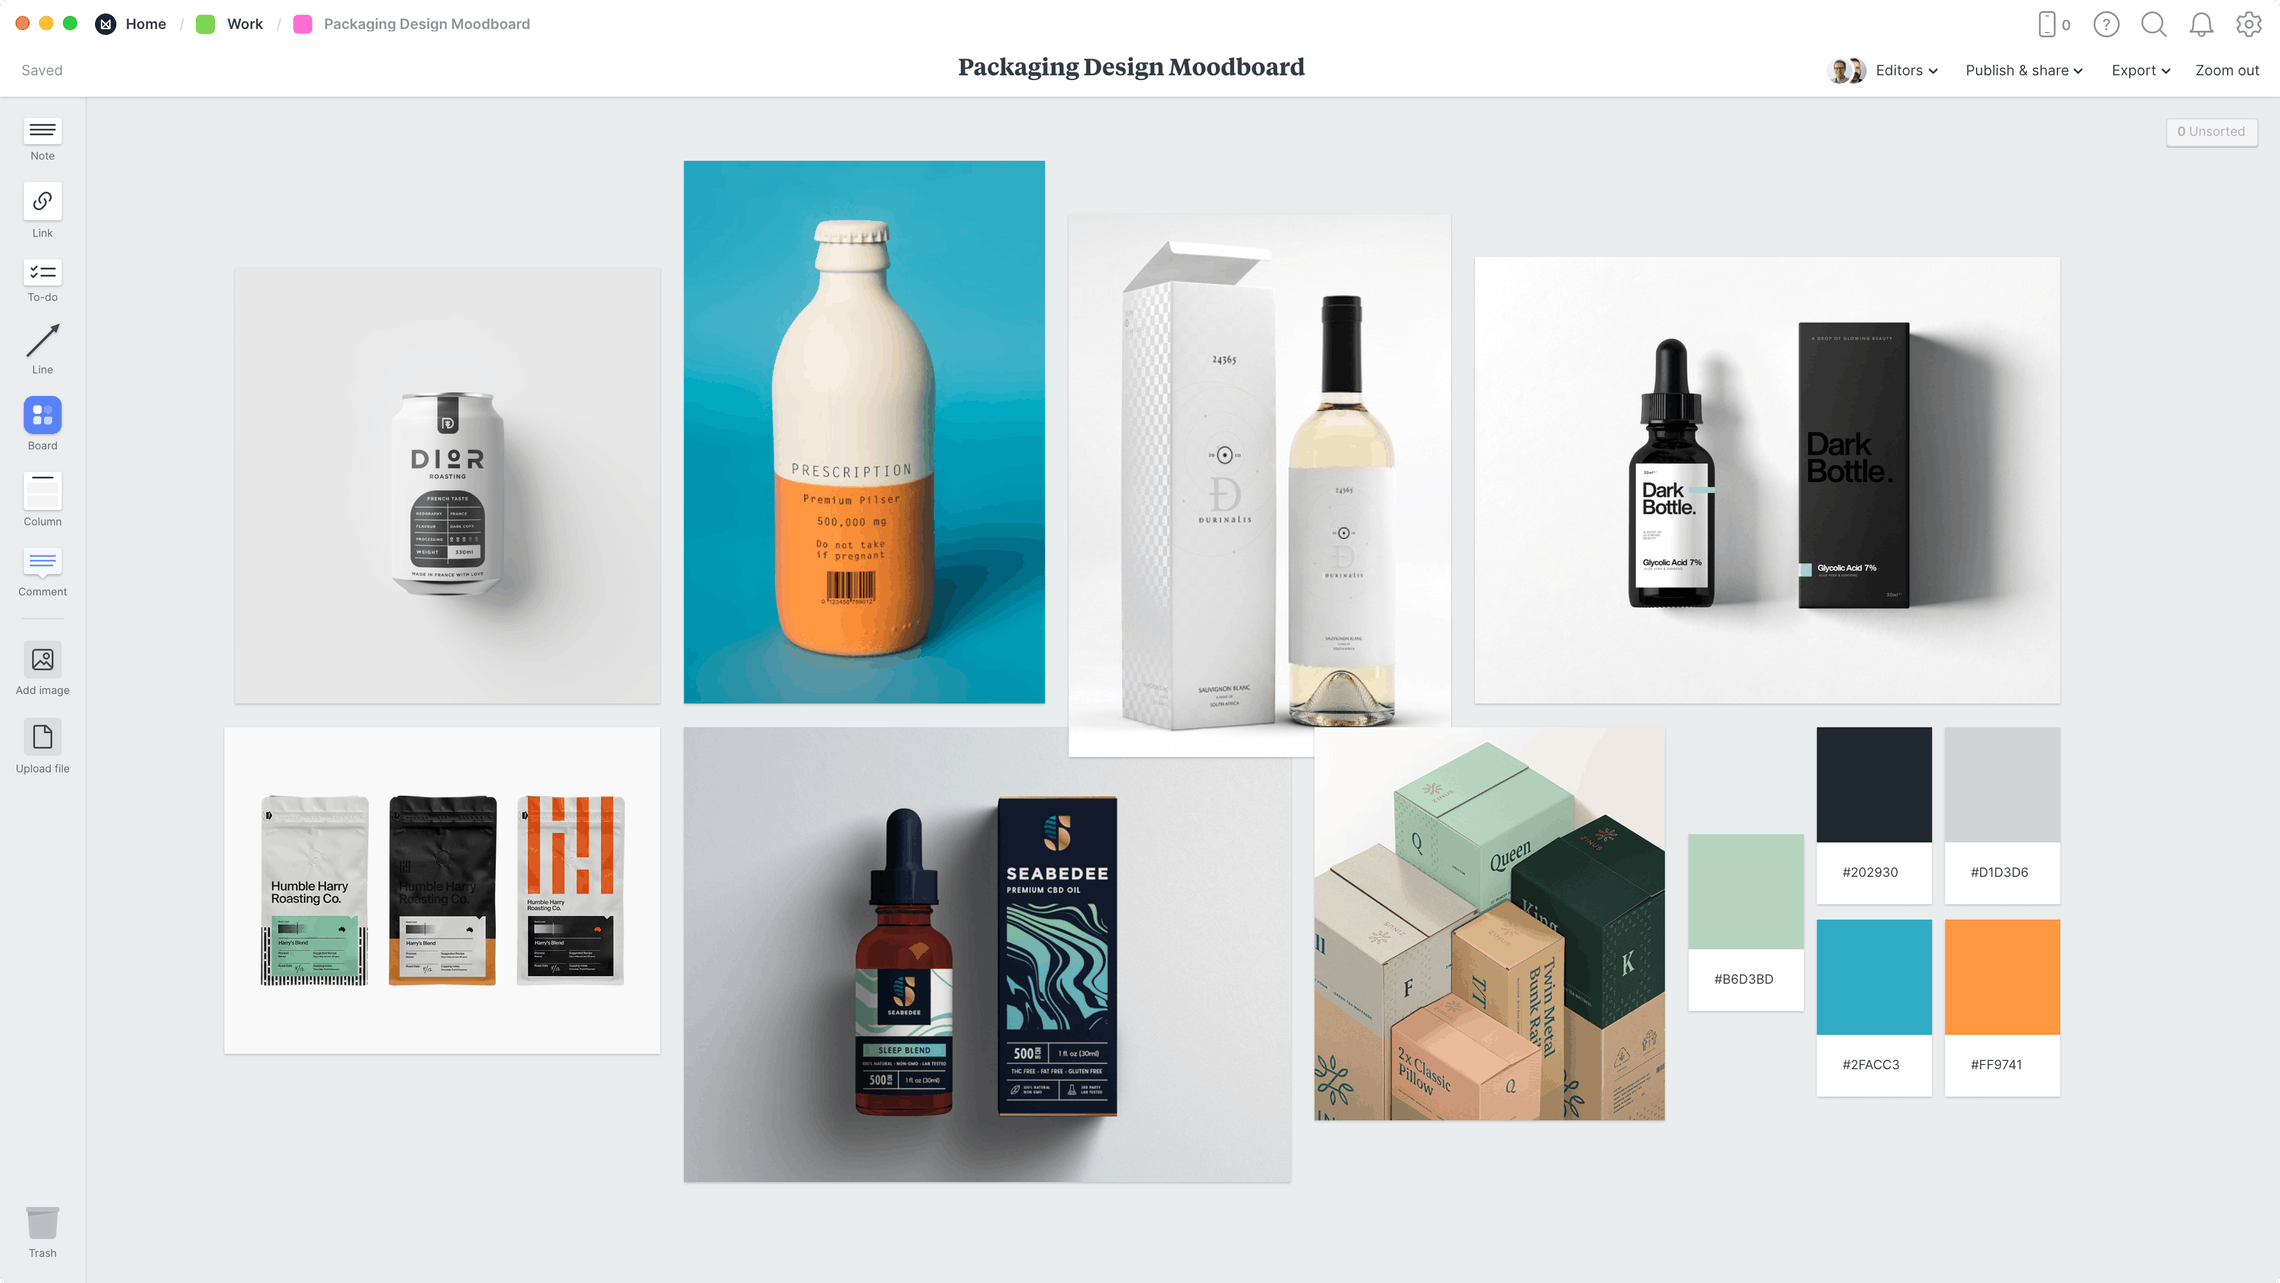 Mood boards in packaging